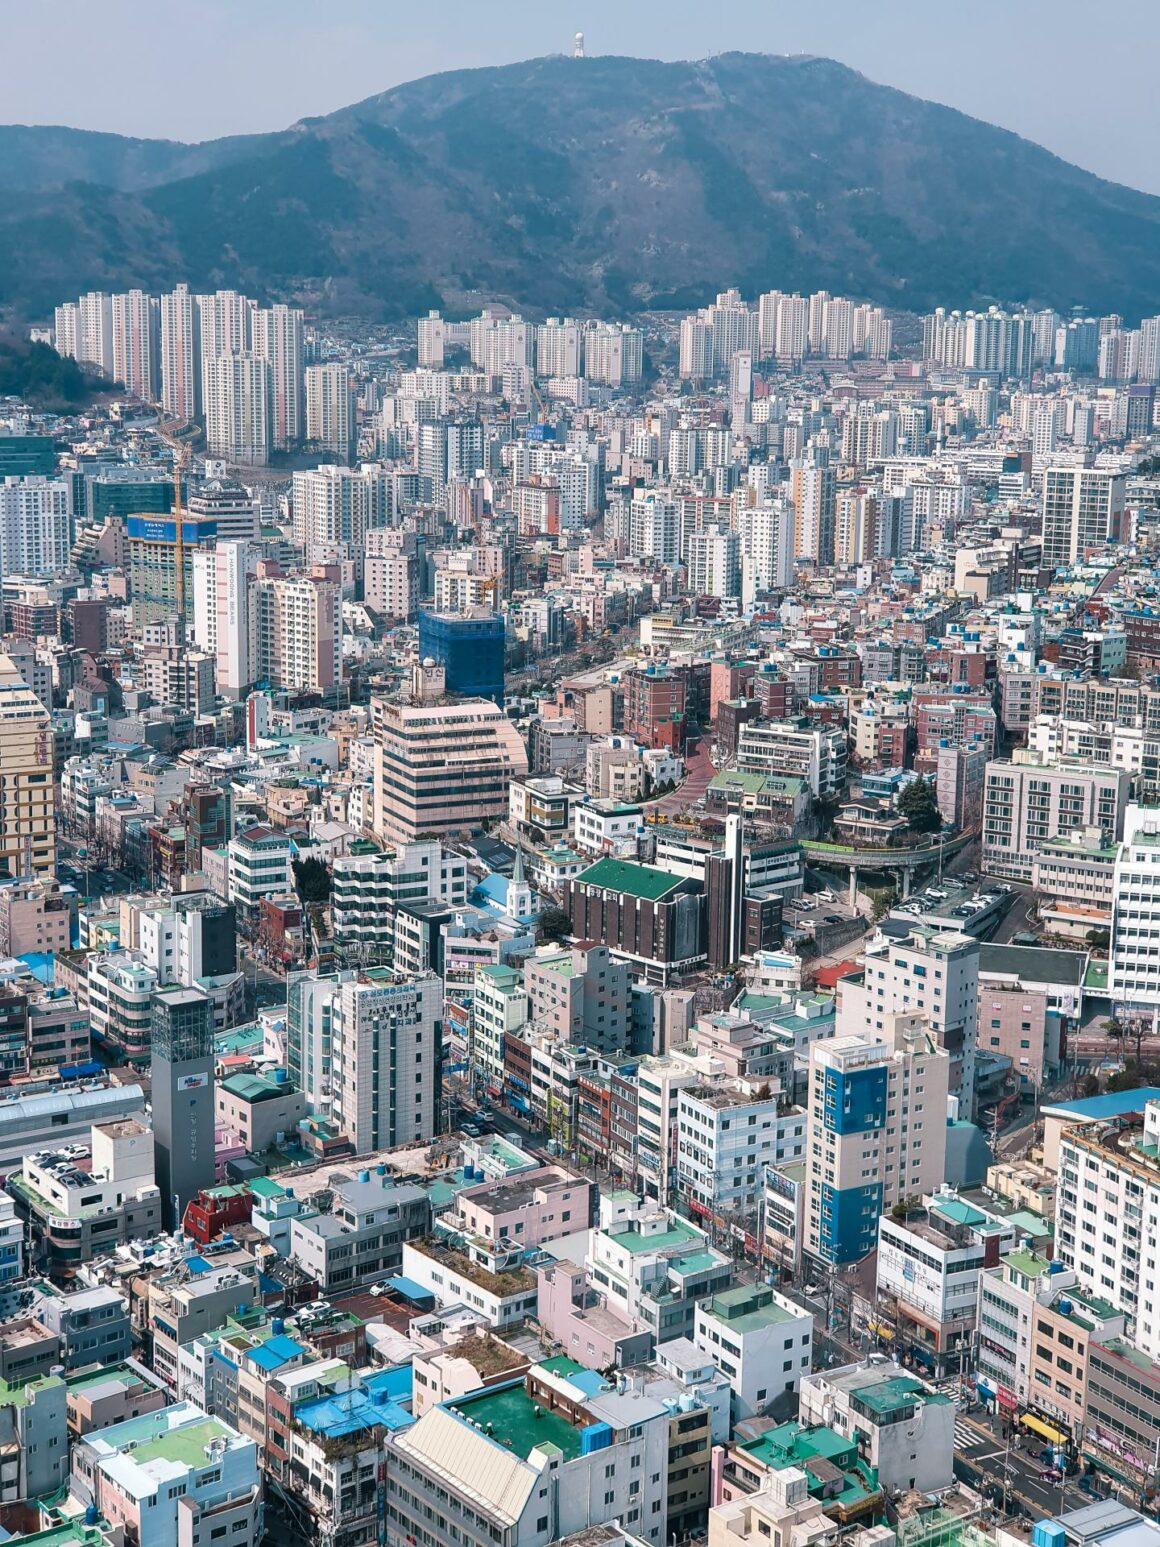 Busan Tower